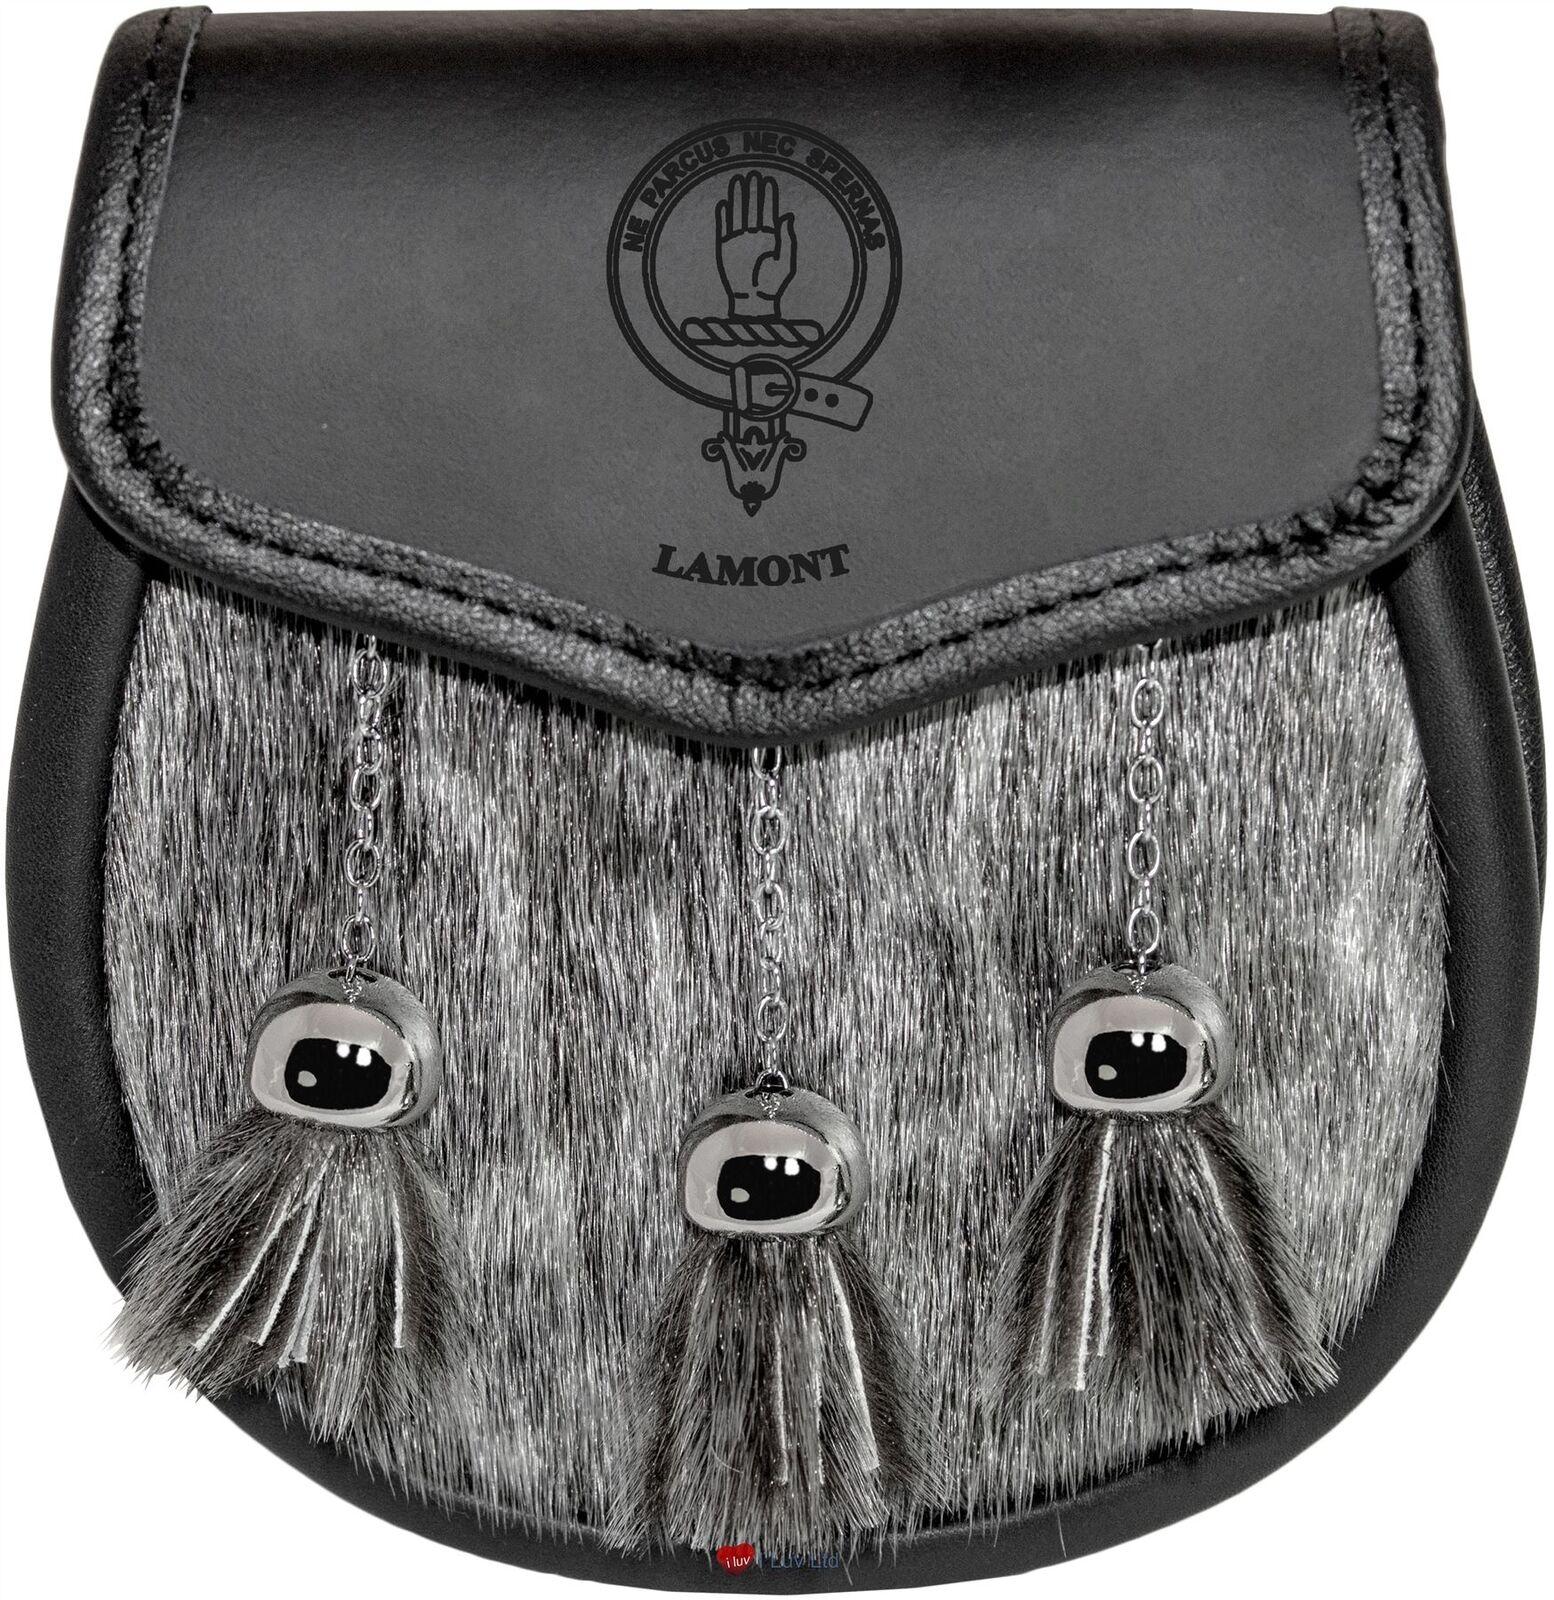 Lamont Semi Dress Sporran Fur Plain Leather Flap Scottish Clan Crest